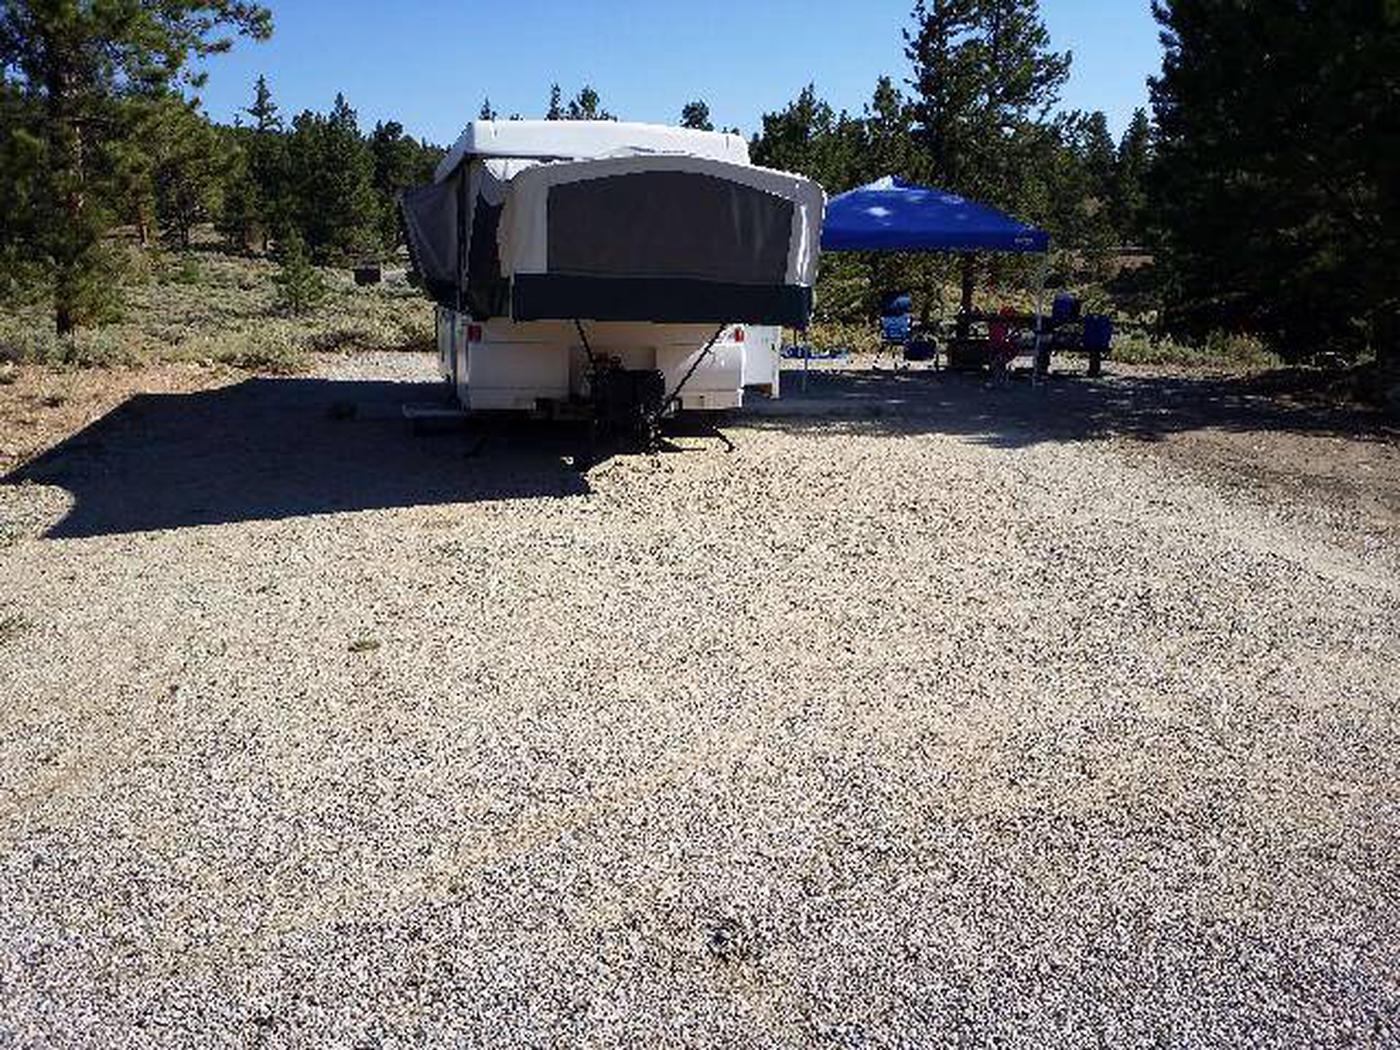 White Star Campground, site 9 parking